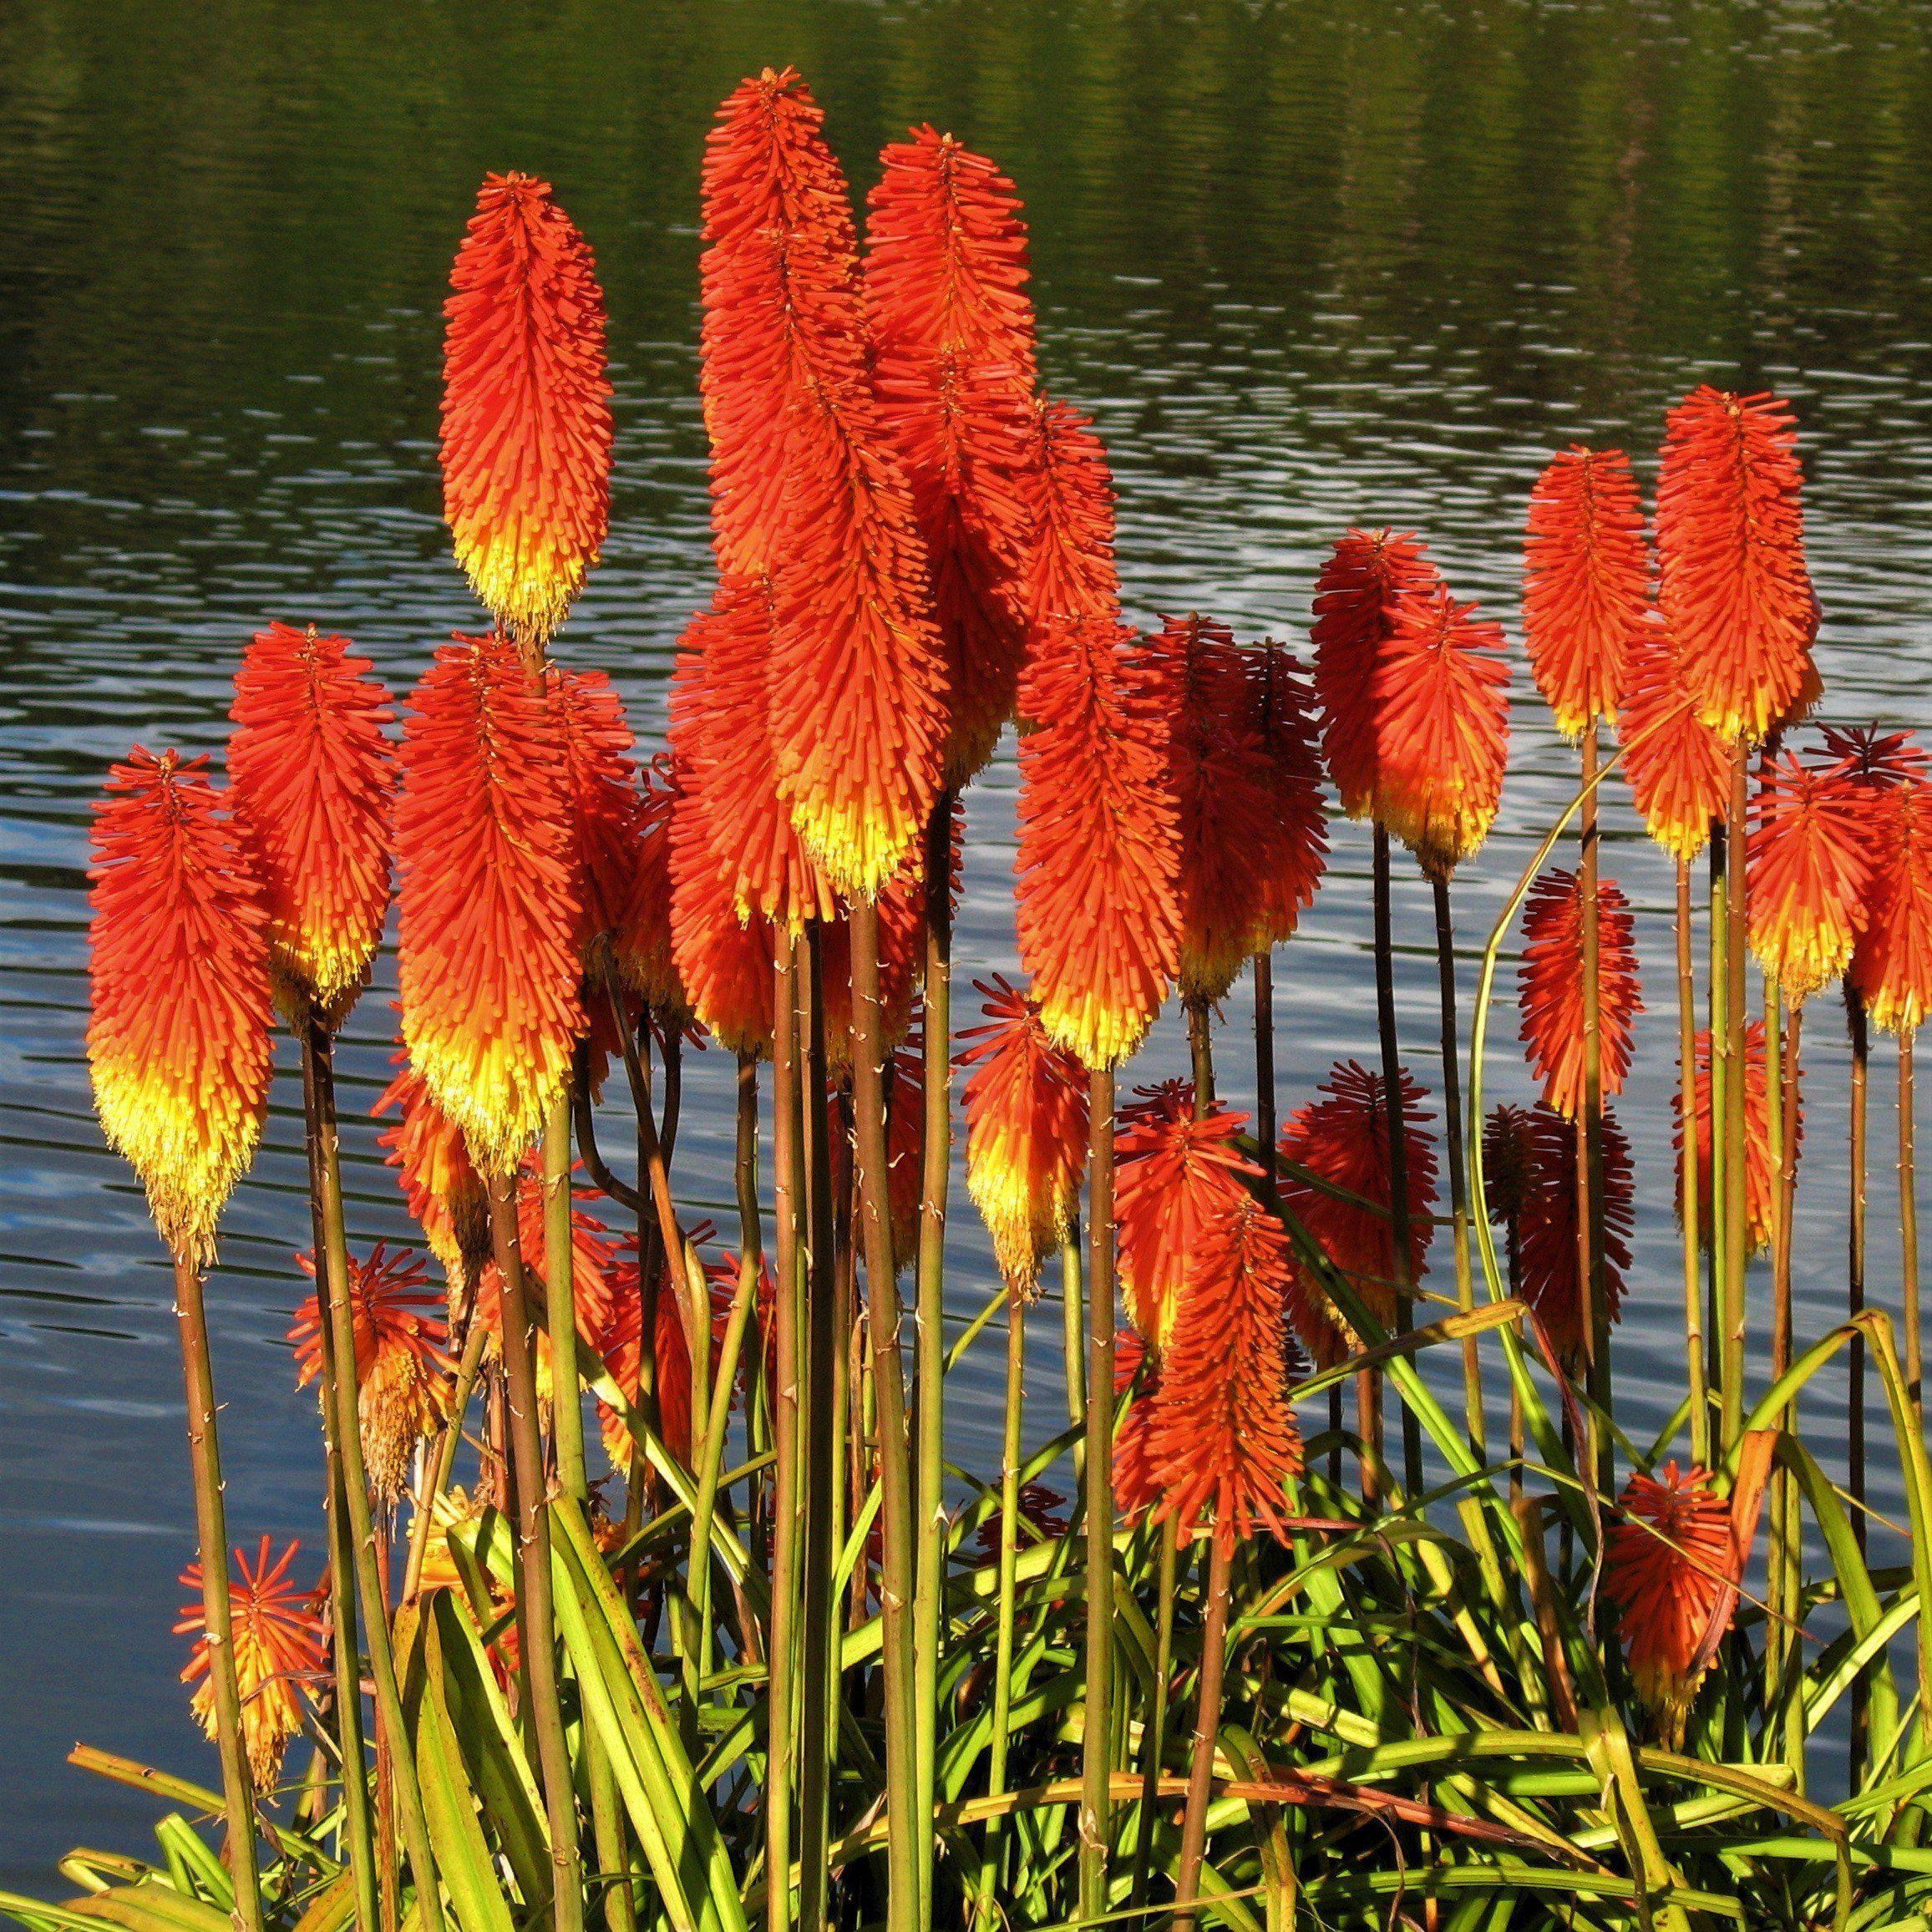 Allium Ampeloprasum Easy To Grow Bulbs Carlsbad Flower Fields Red Hot Poker Plant